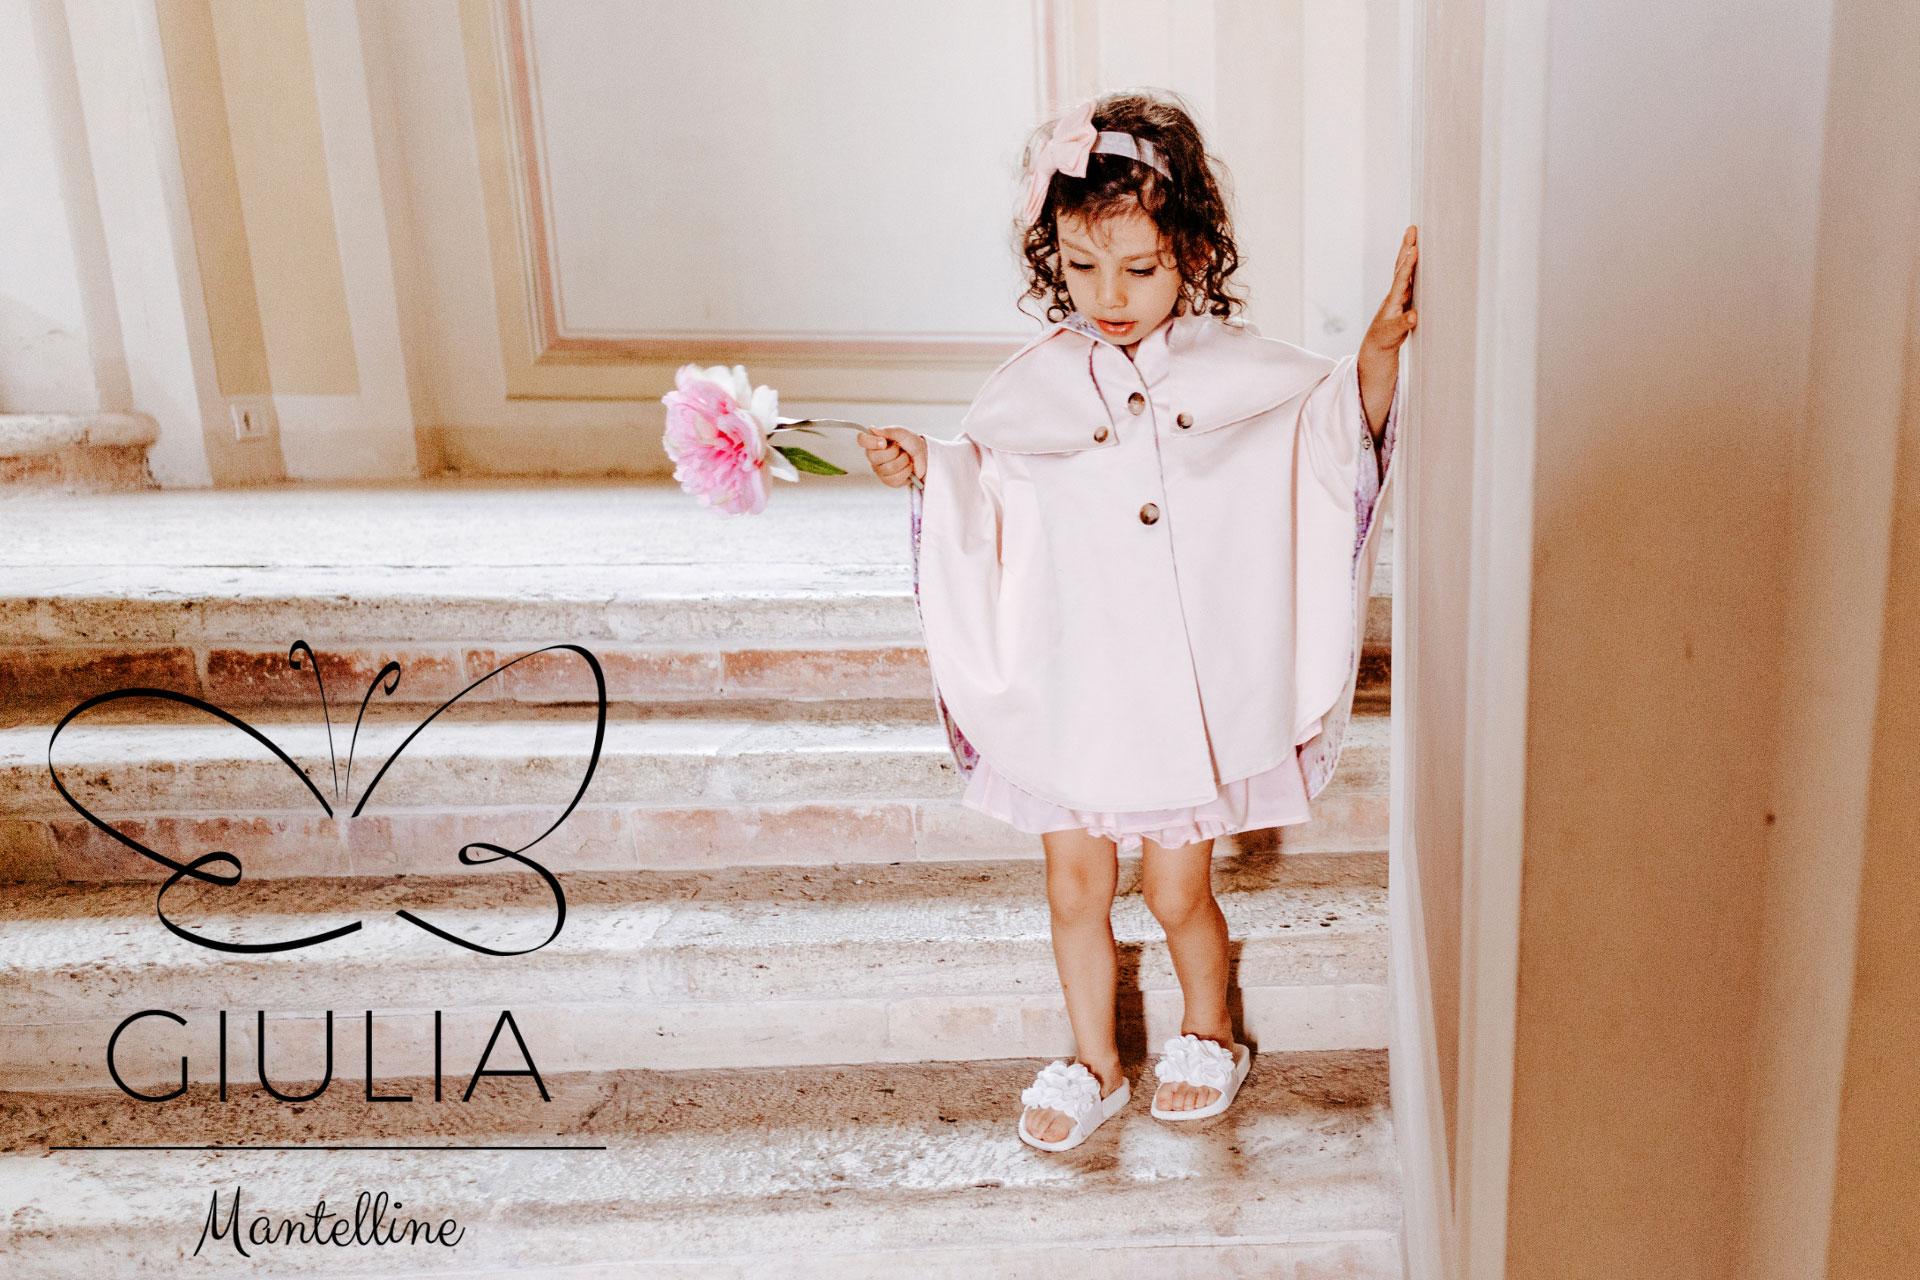 Mantellina da bimba Giulia Mantelline